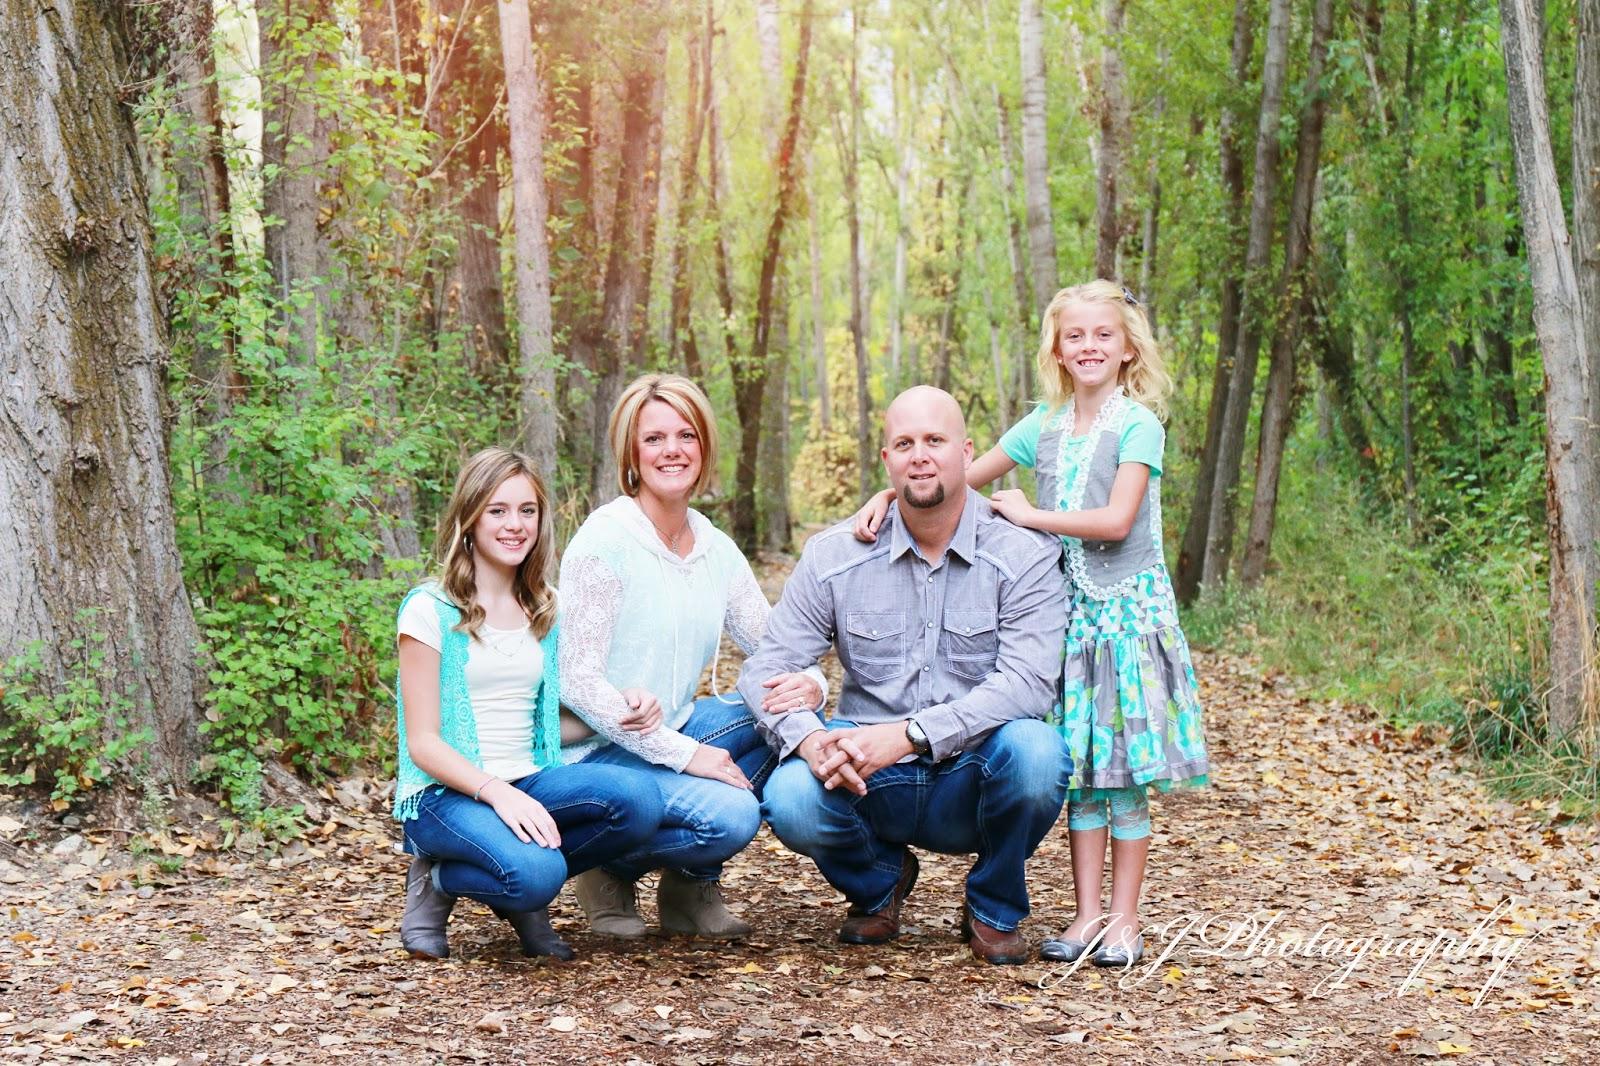 J&J Photography: {P Family} Davis County Layton Family Photographer